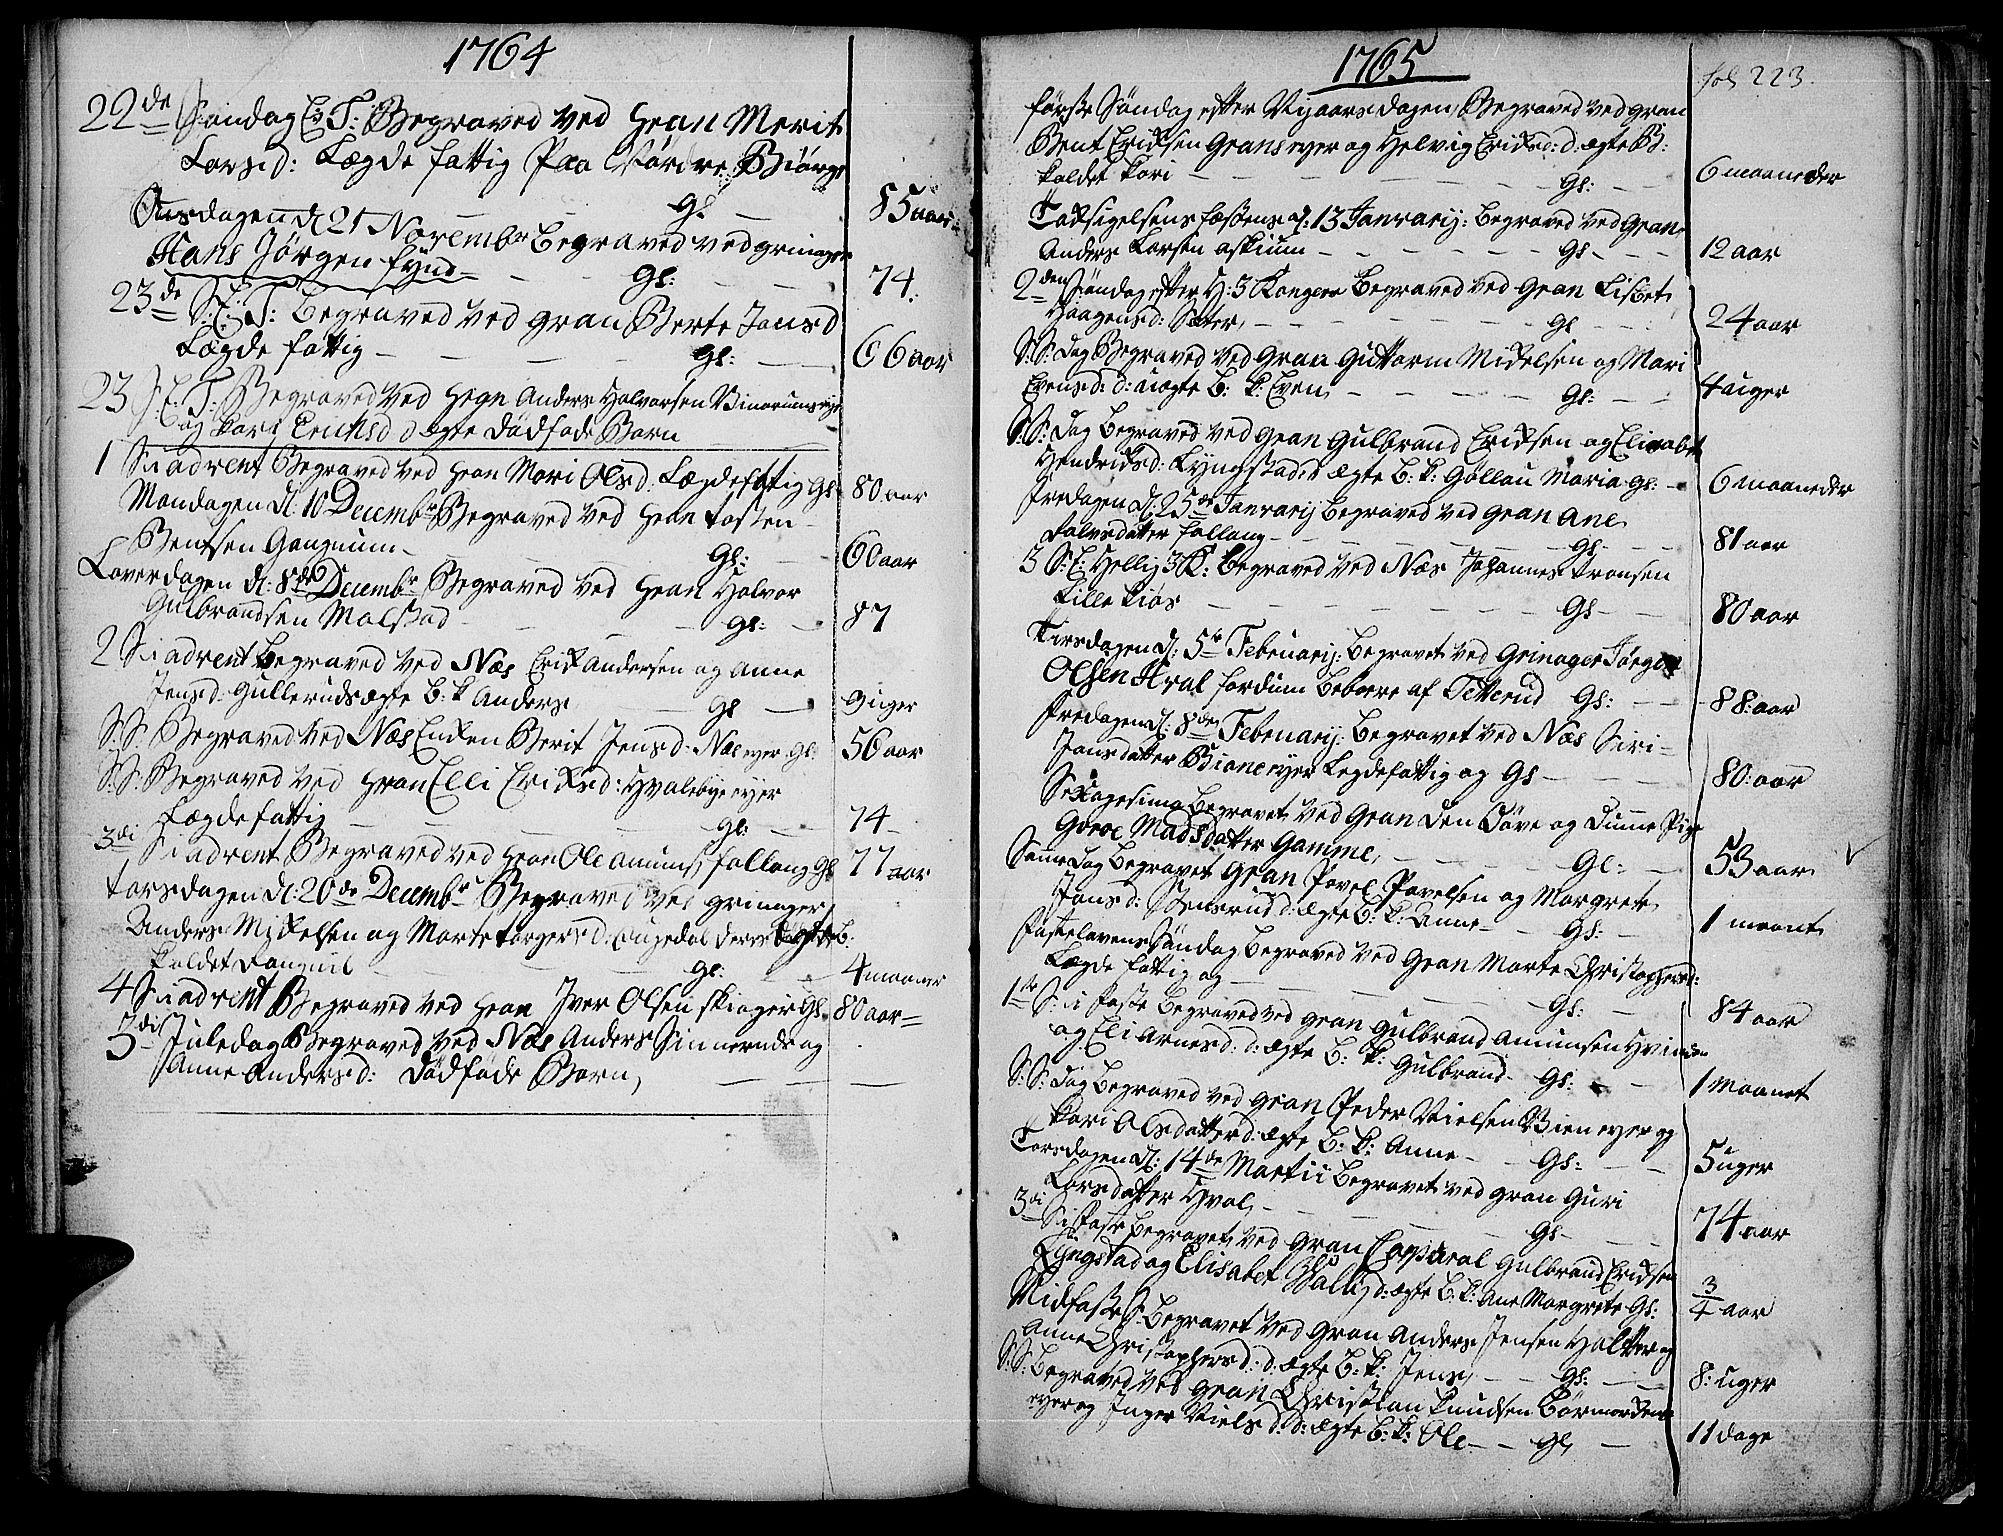 SAH, Gran prestekontor, Ministerialbok nr. 4, 1759-1775, s. 223